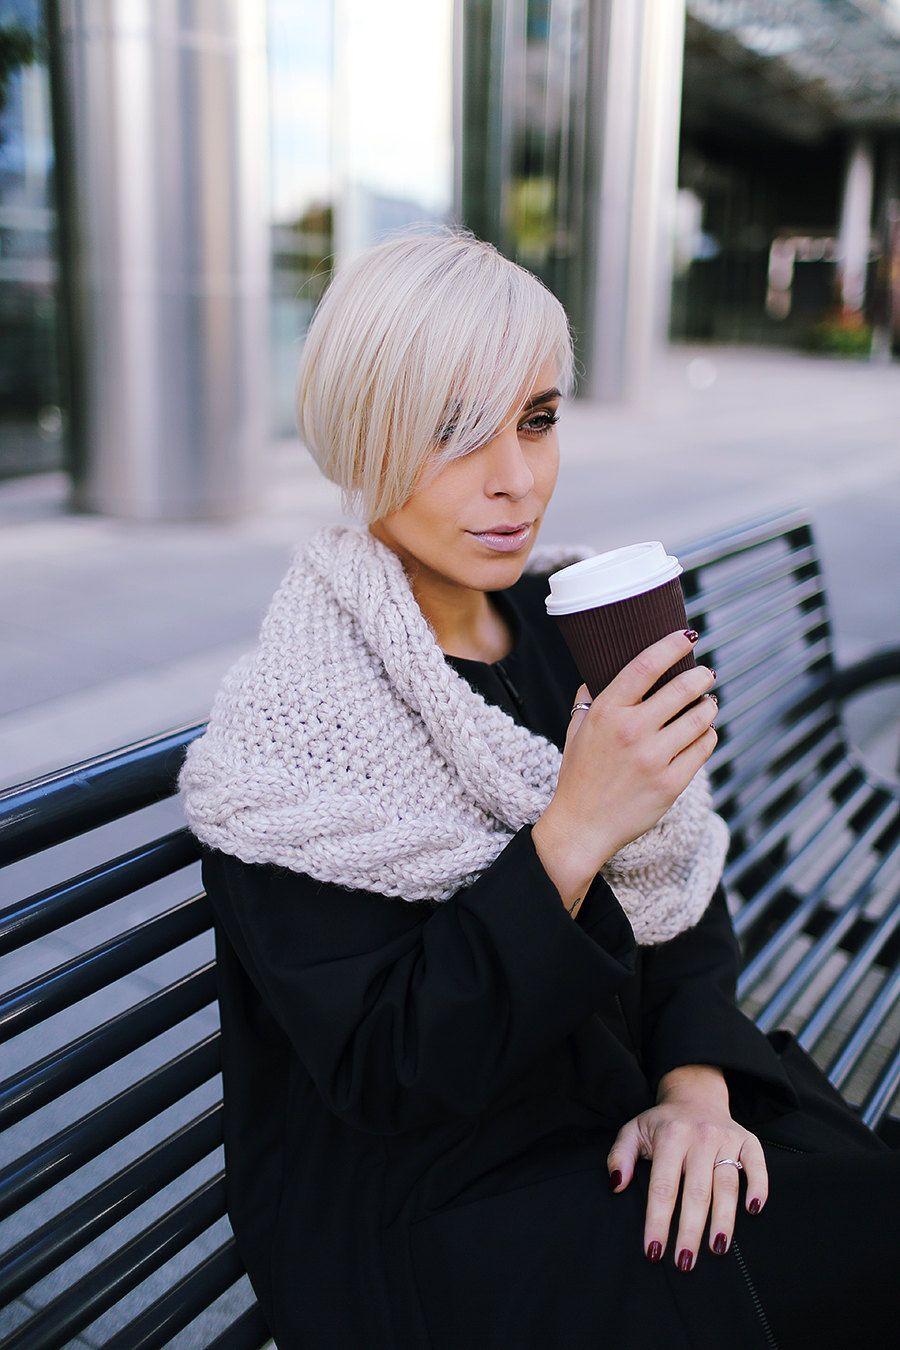 Pearl alpaca wool snood | Knitted scarf | Infinity scarf | Chunky scarf | Shalf | Loop scarf | Hooded | Designer's scarf | Kotè design by KoteStudio on Etsy